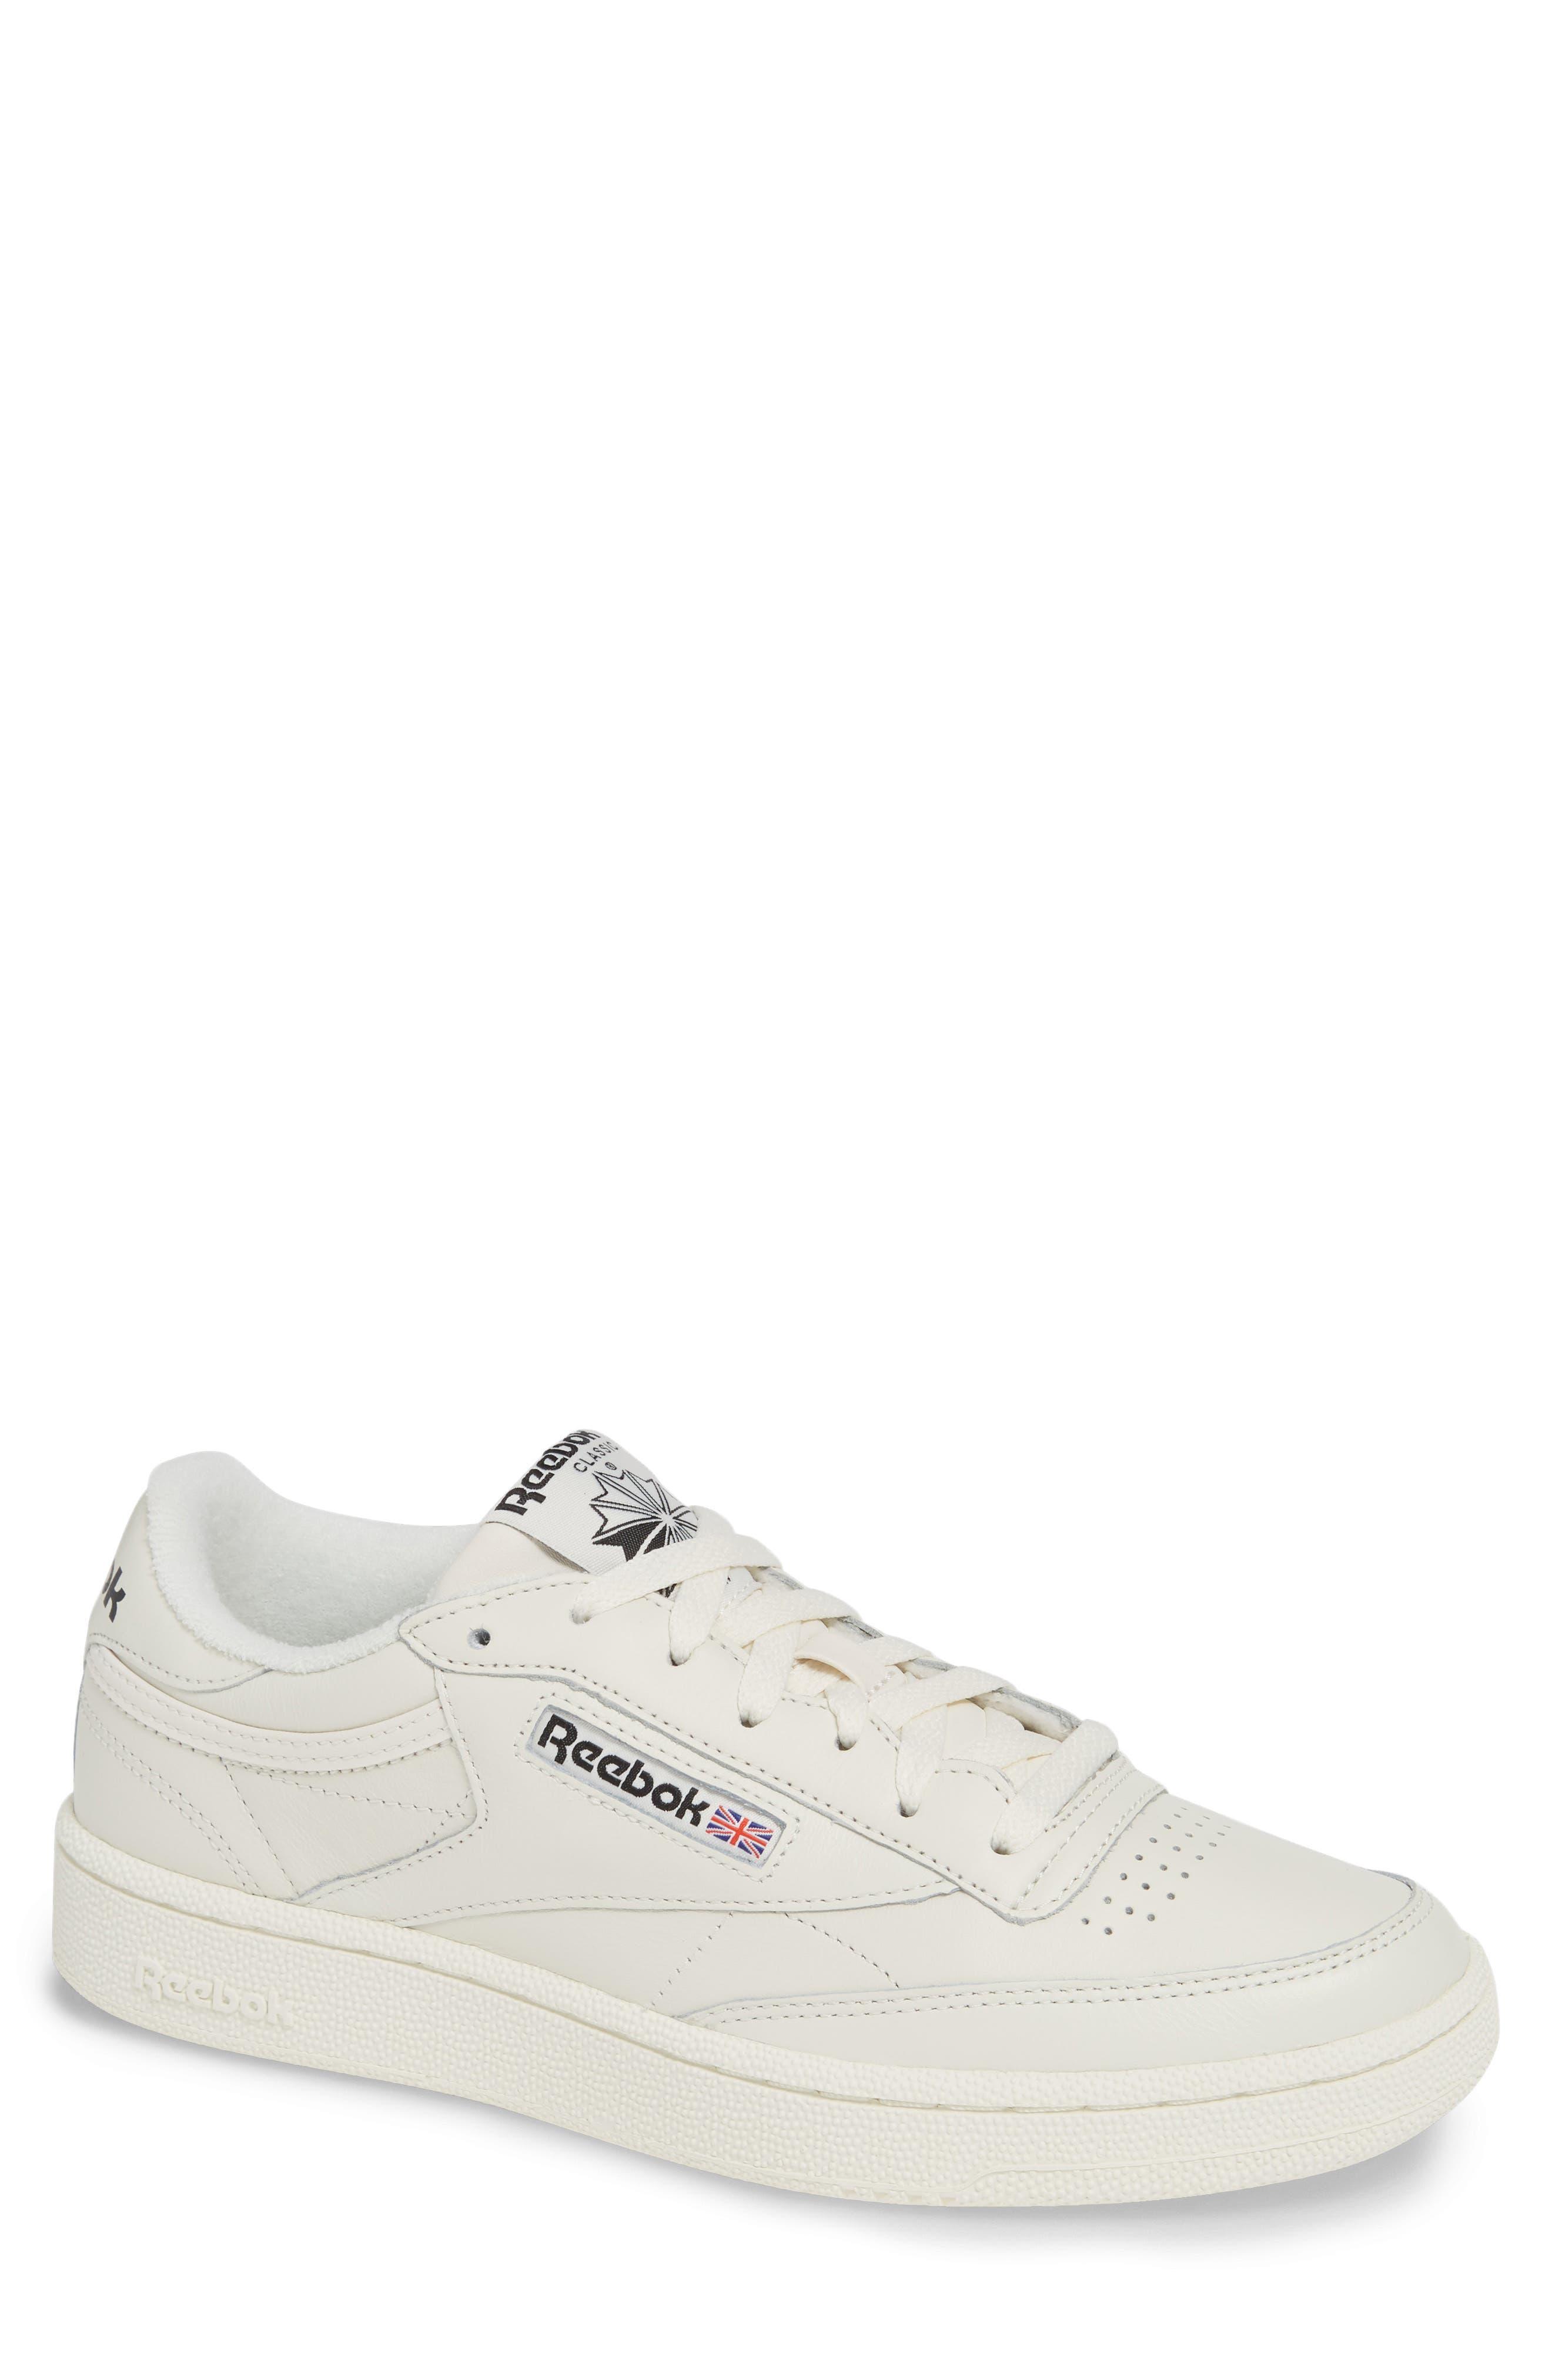 Vintage Club C 85 MU Sneaker,                         Main,                         color, CHALK/ BLACK